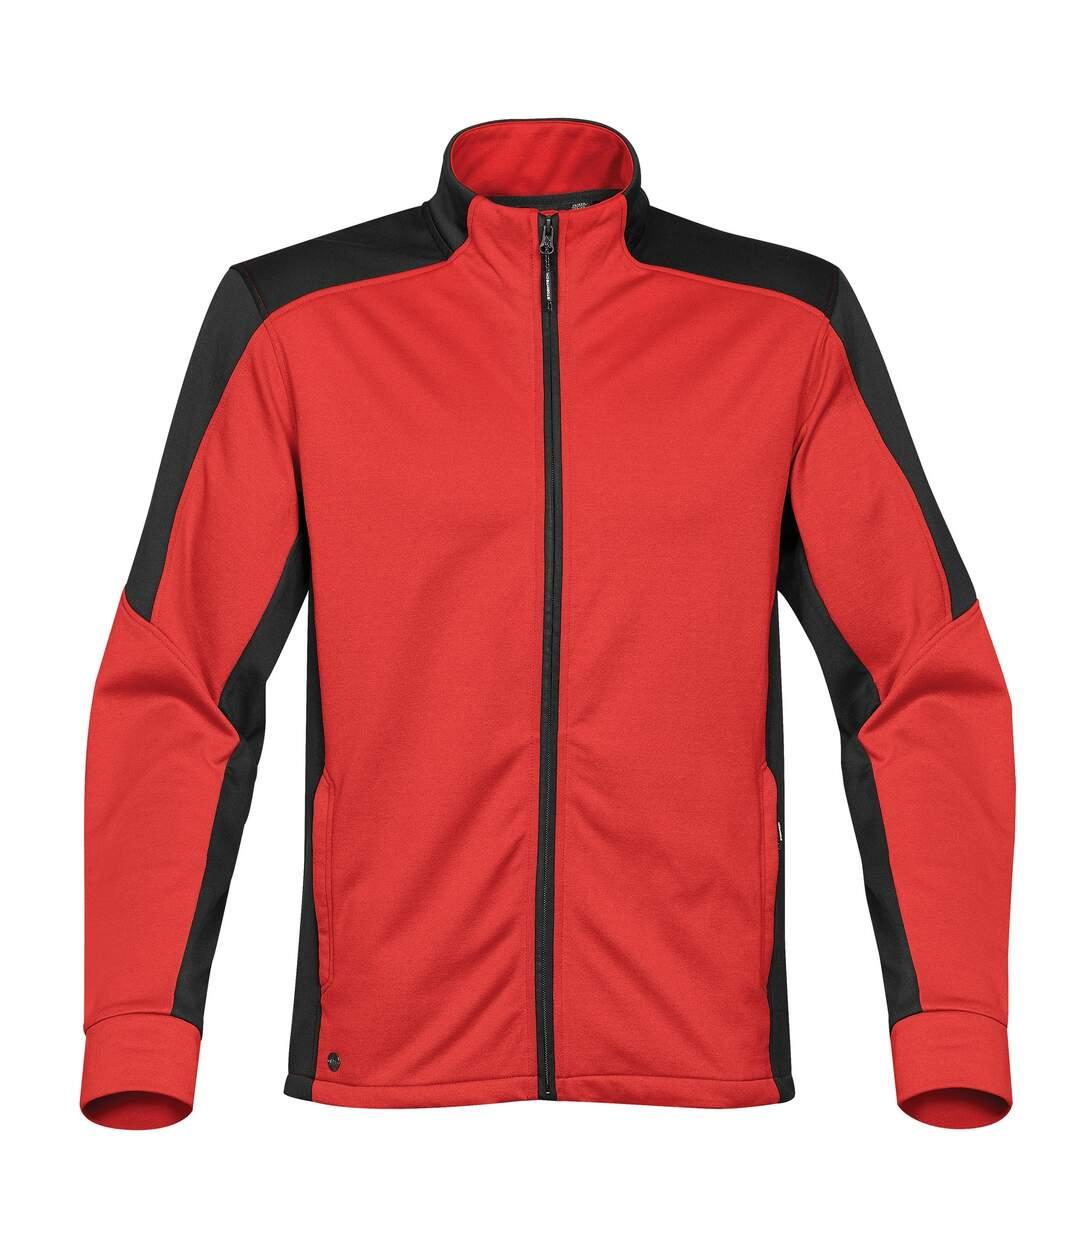 Stormtech Mens Chakra Fleece Jacket (Bright Red) - UTRW5982